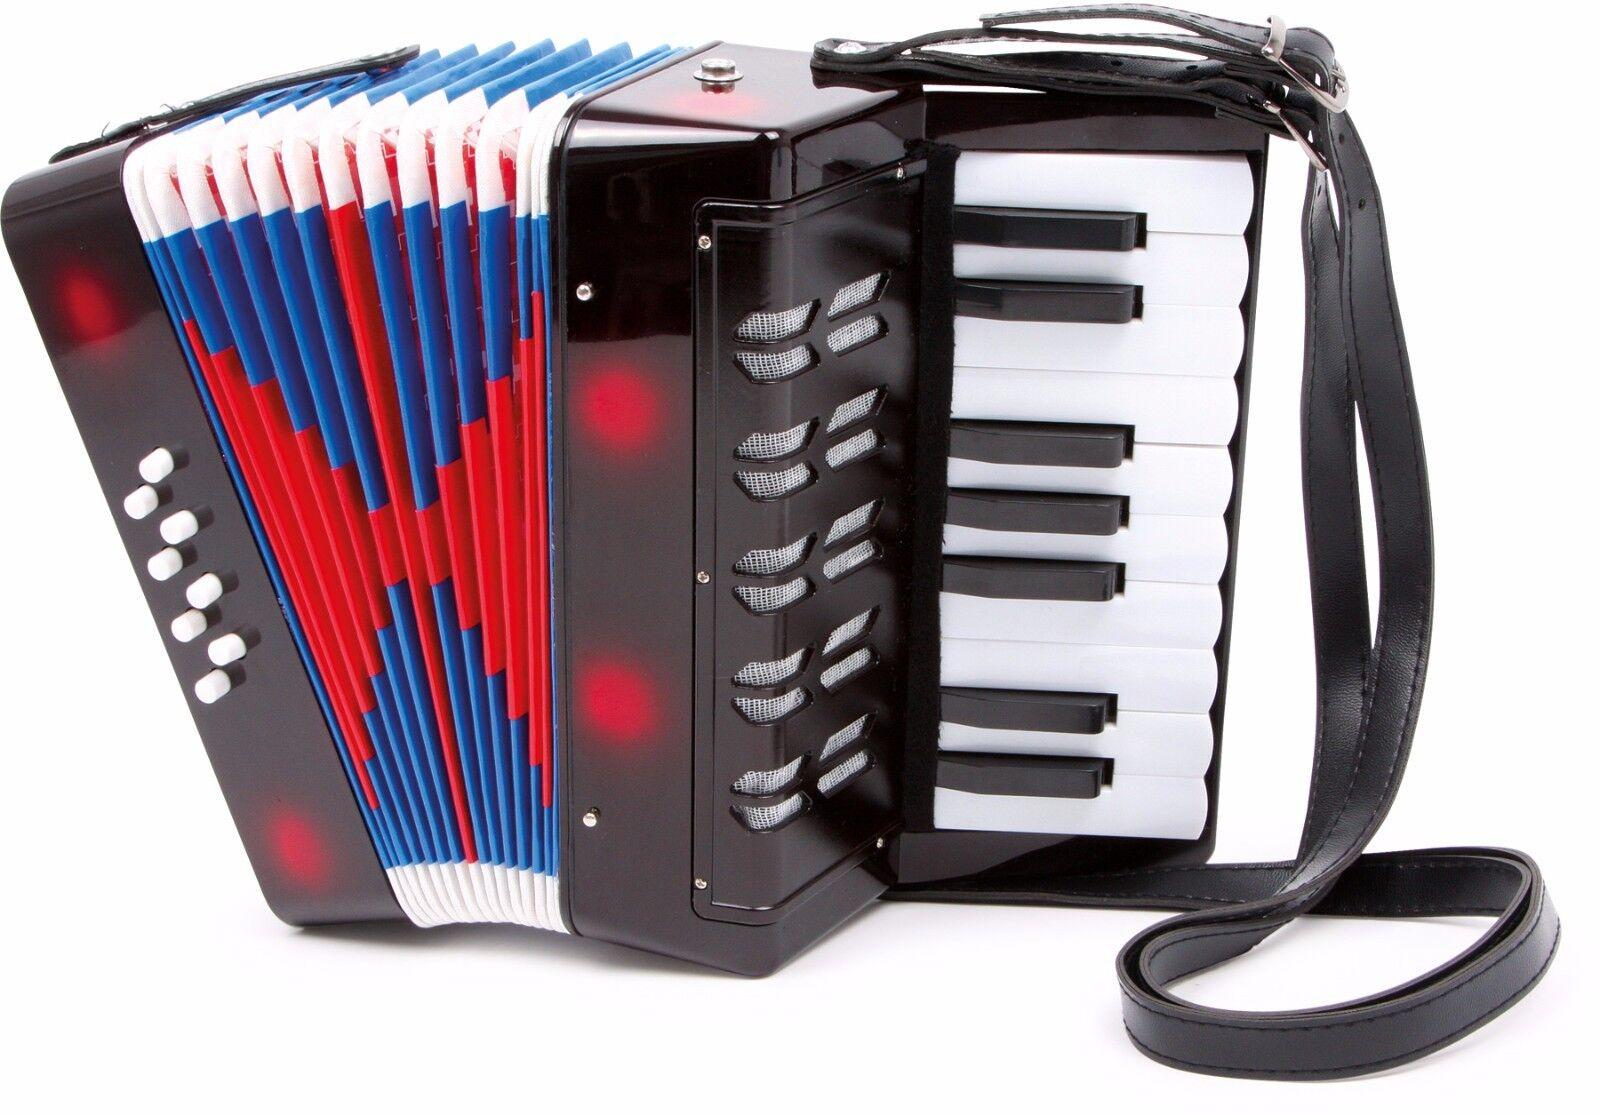 Akkordeon Classic für Kinder Kinder Kinder Musik Instrument Zieharmonika Musikinstrument Neu 815b99